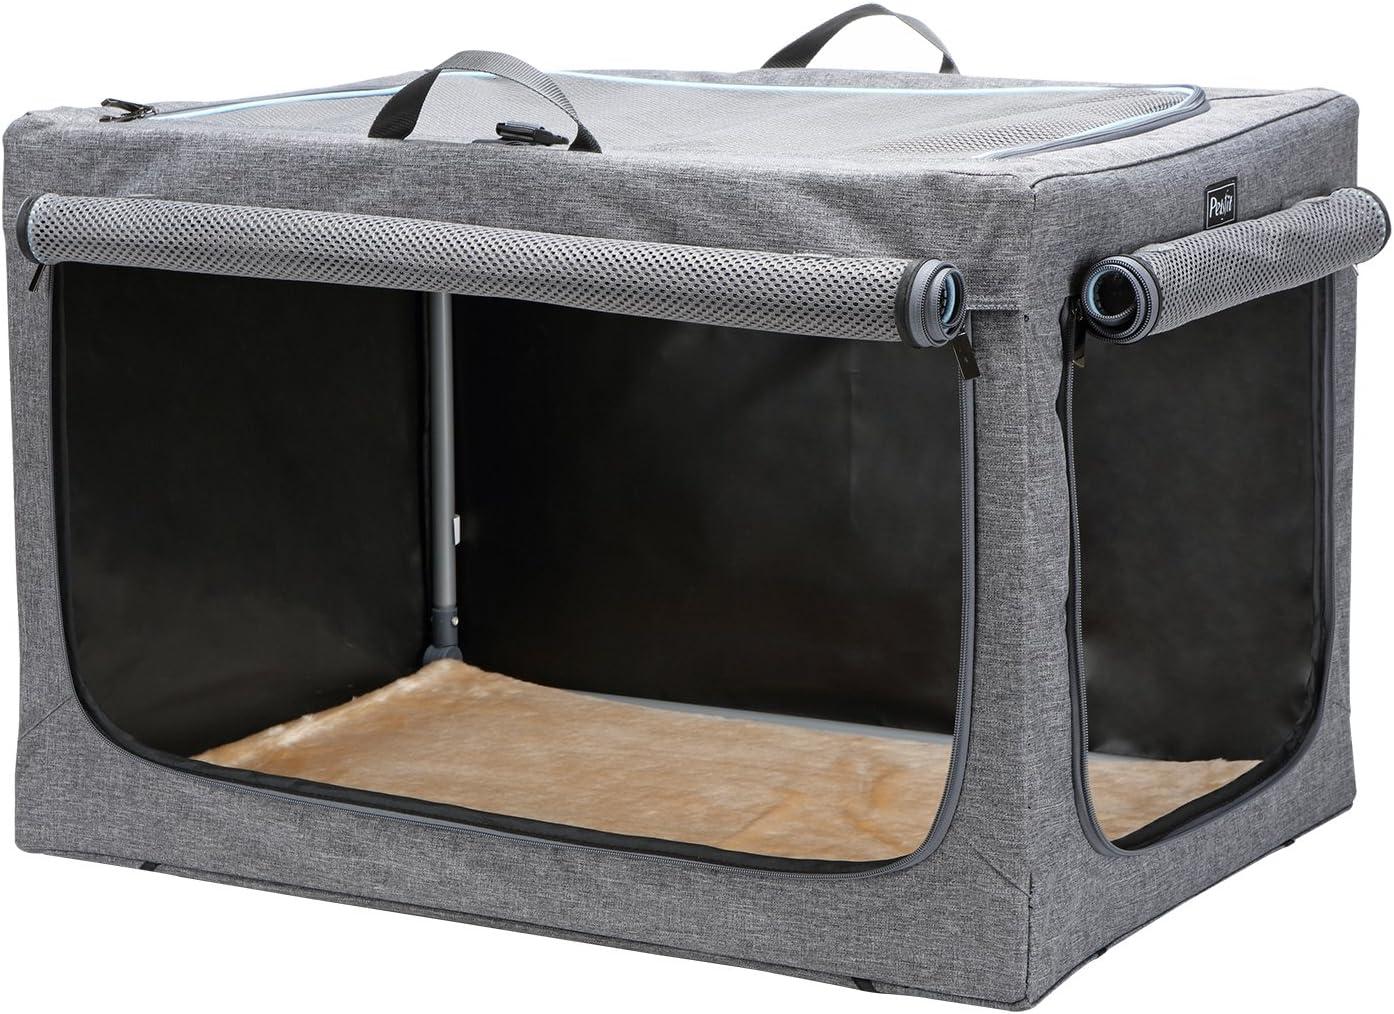 Petsfit Travel Pet Home Indoor/Outdoor for Dog